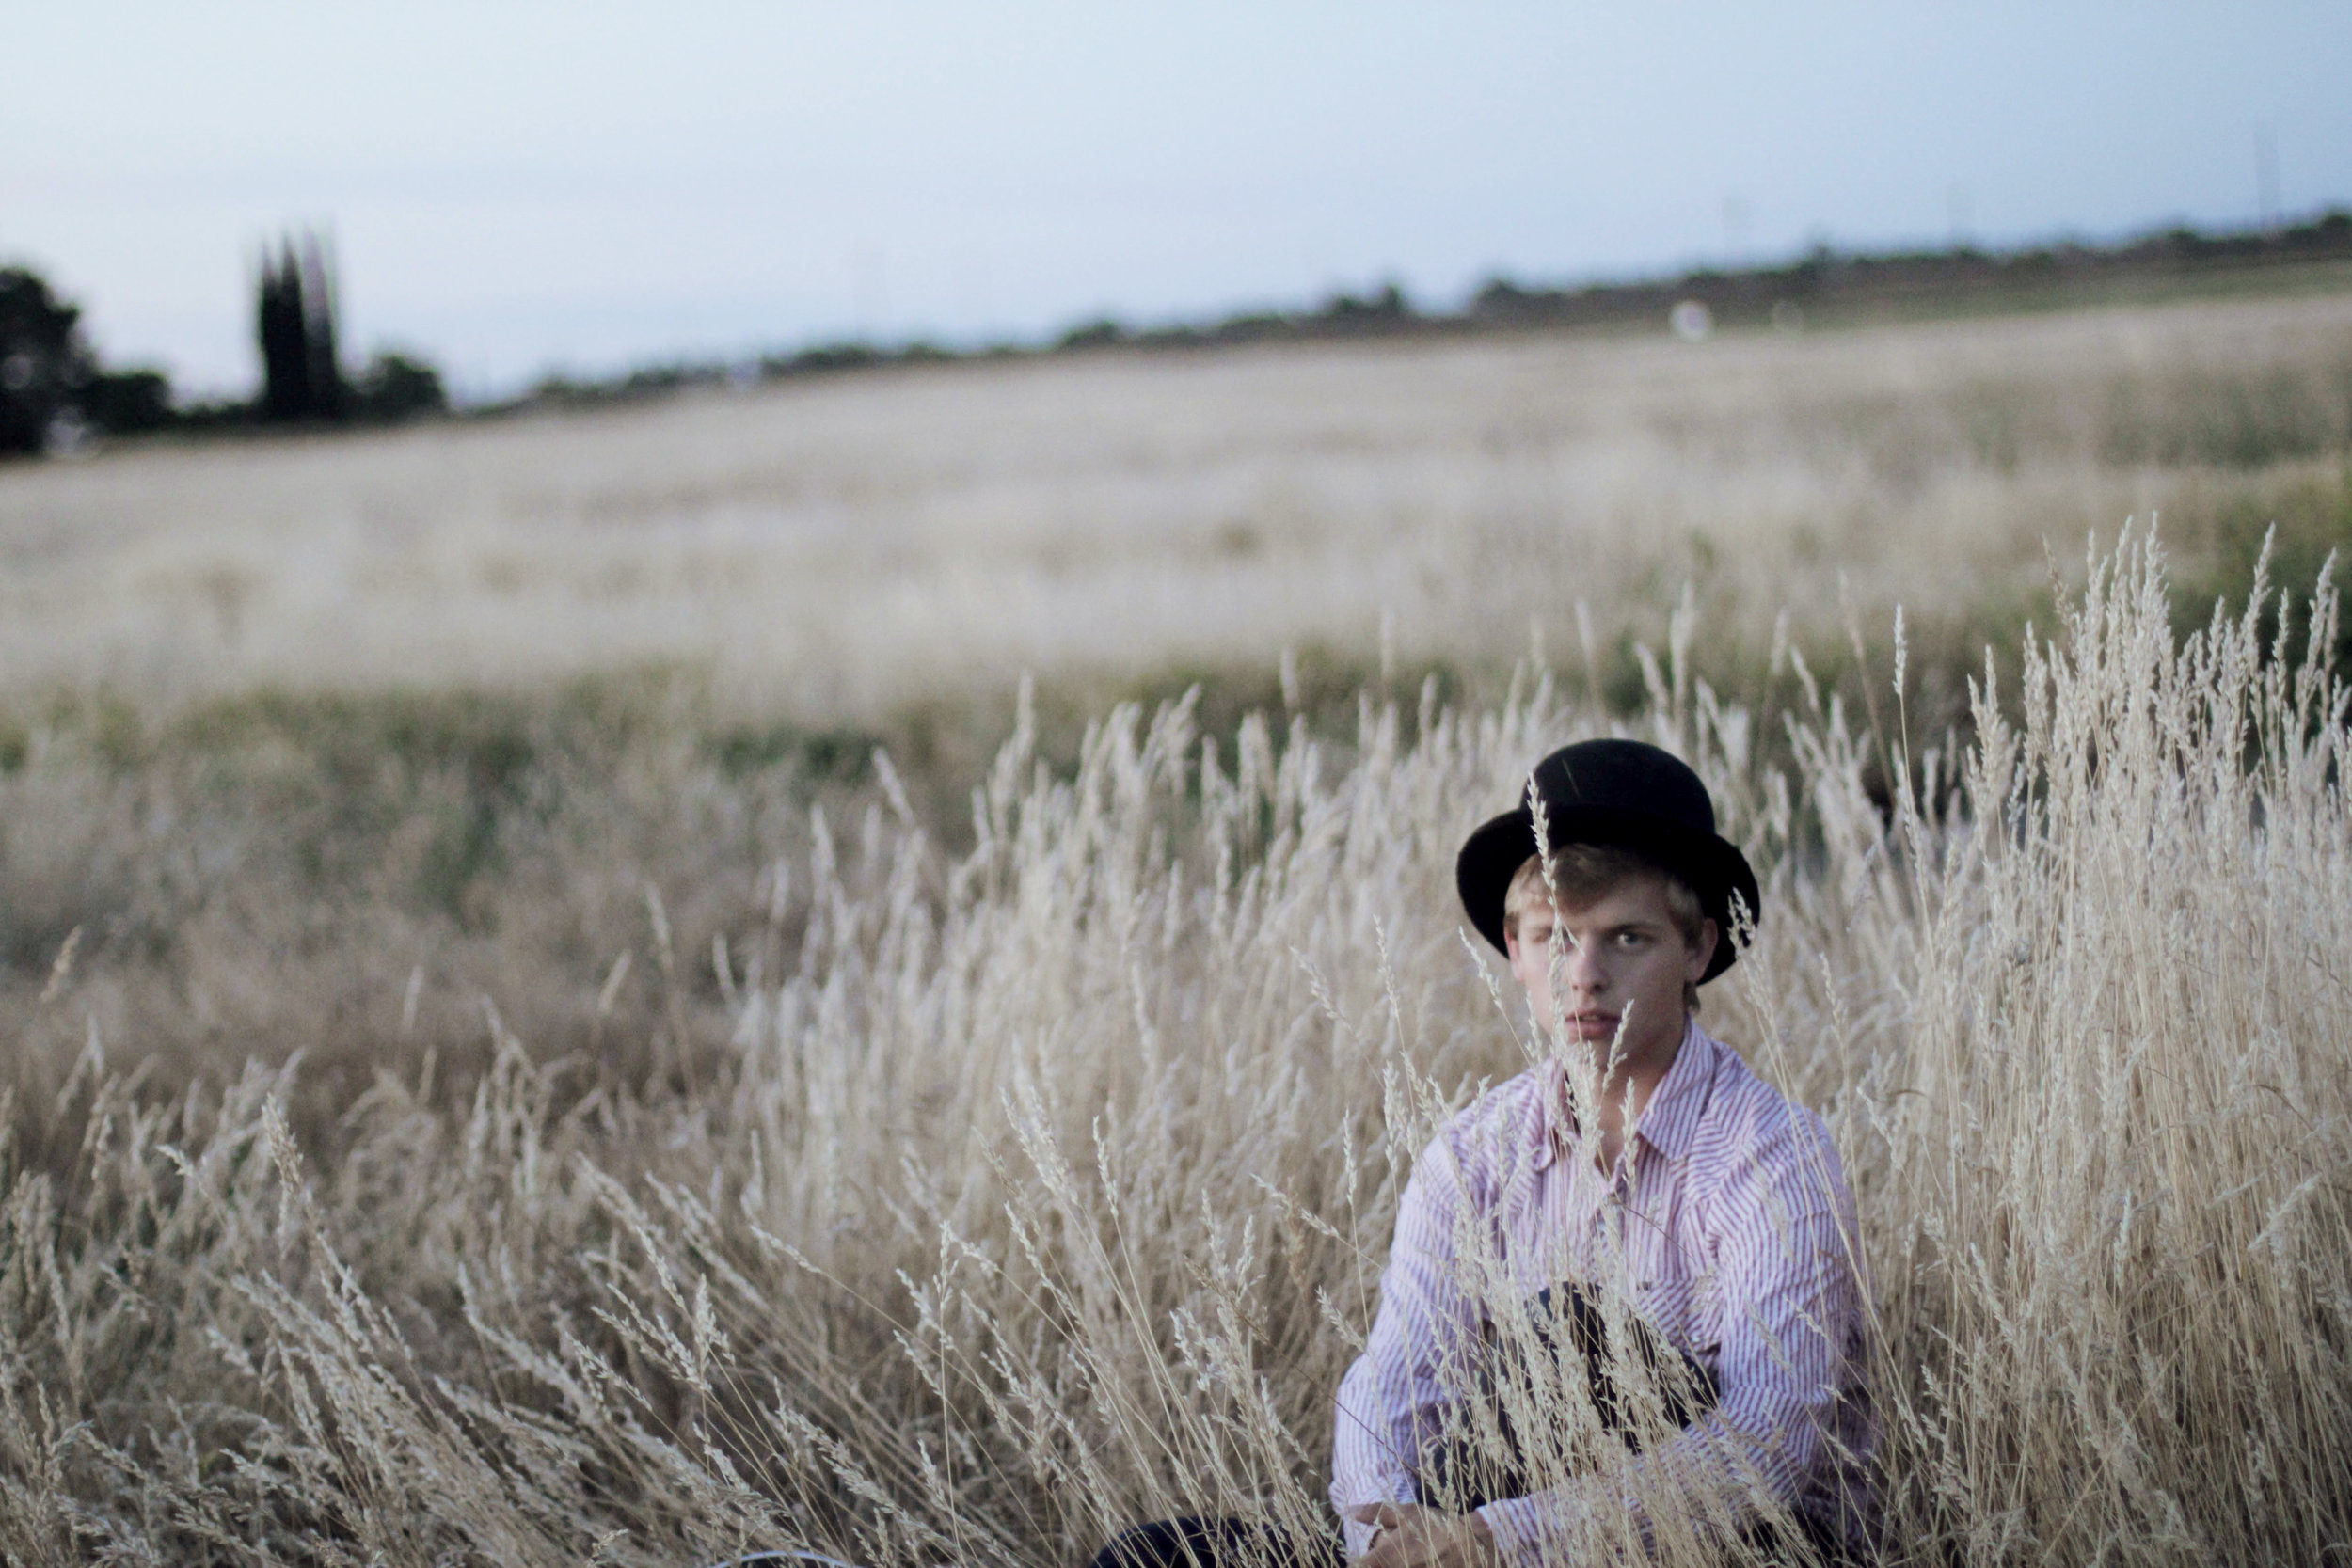 Connor in the Field